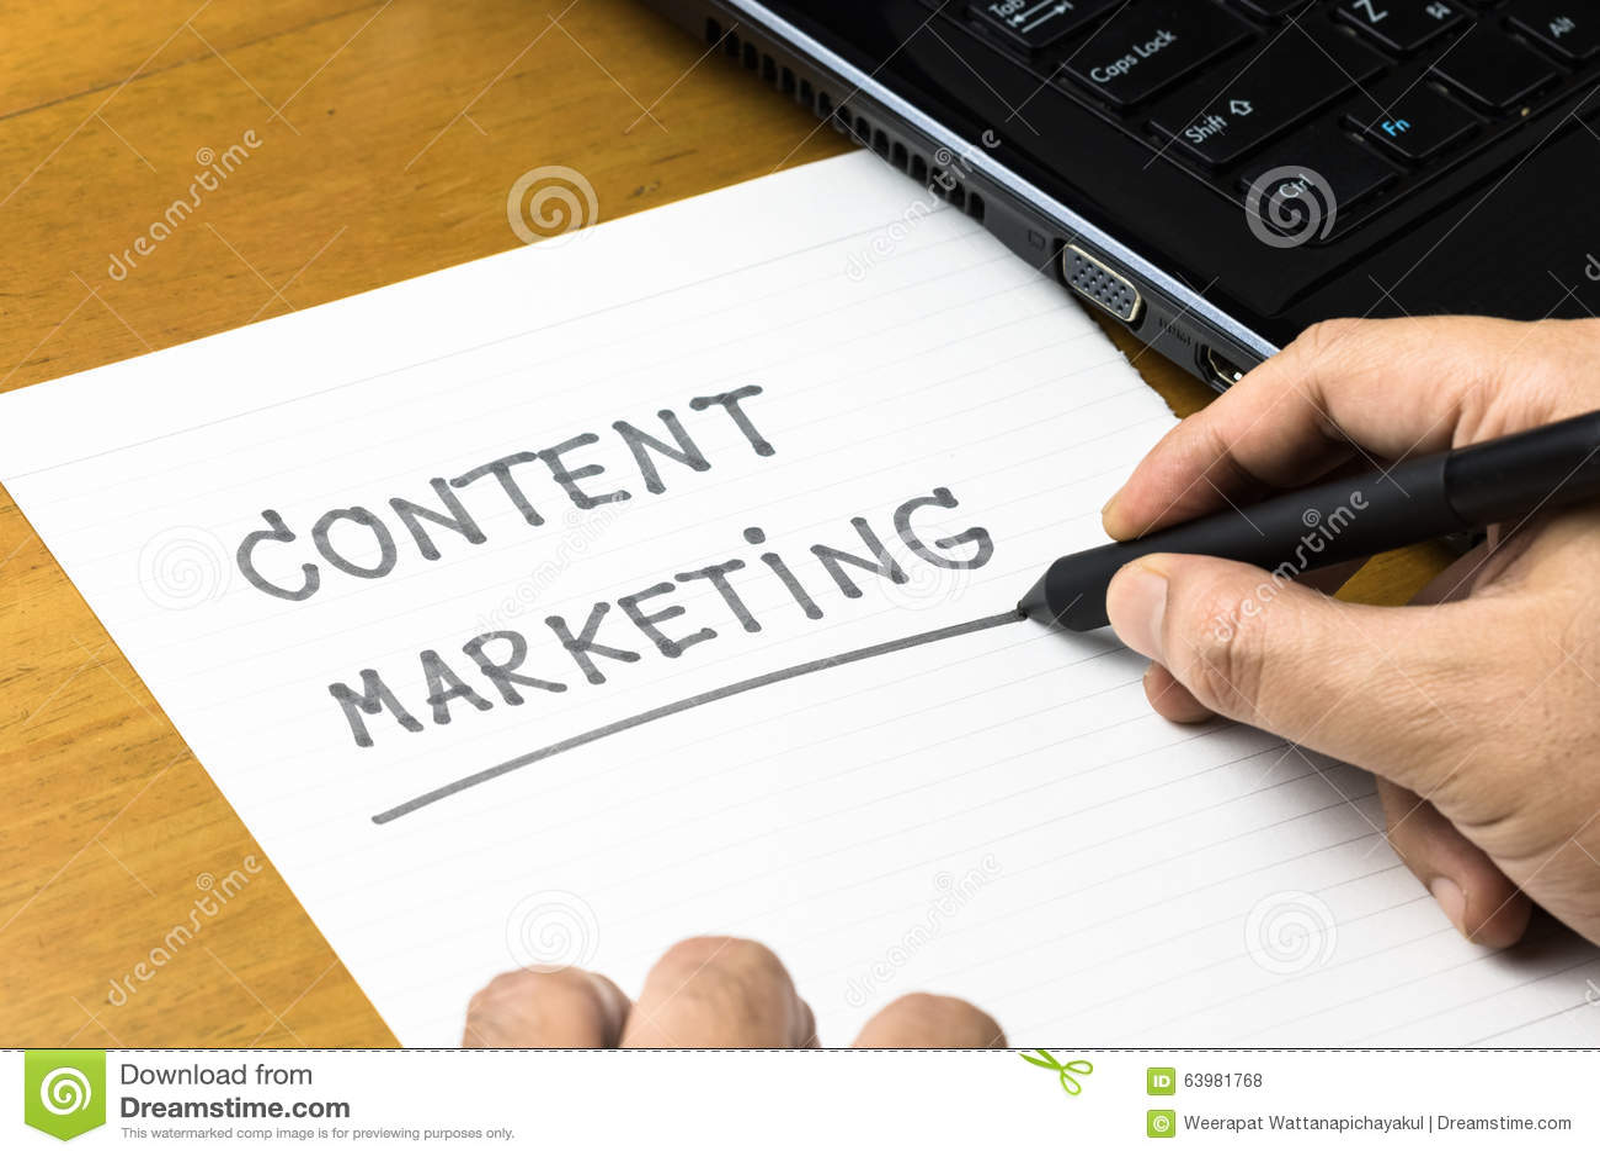 Service marketing term paper